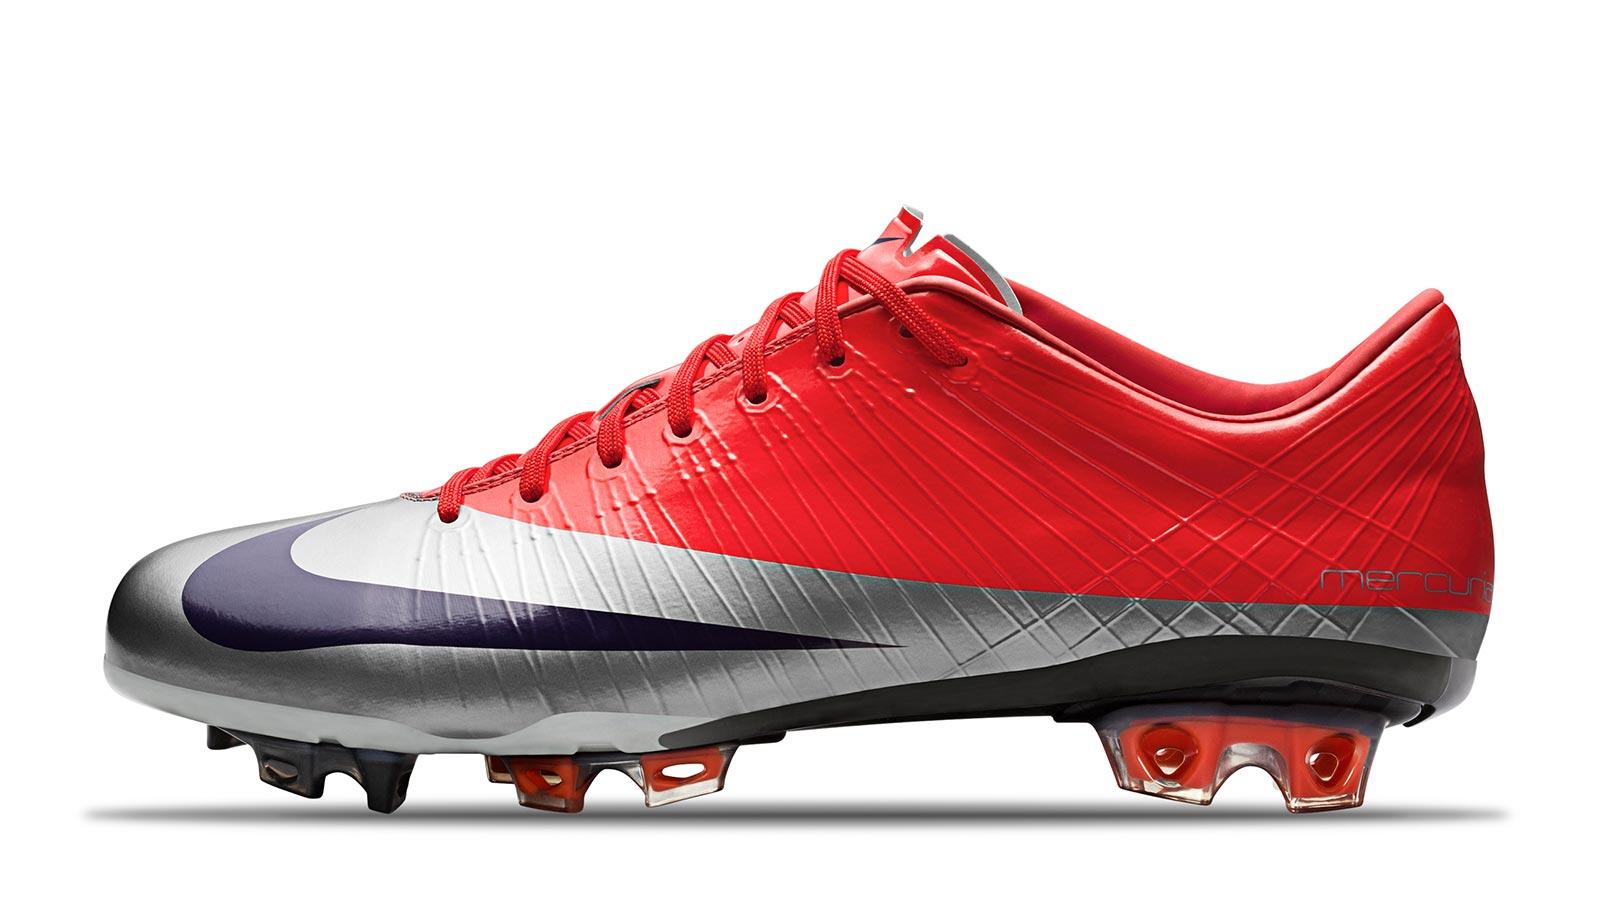 Extrêmement All Nike Mercurial Boots Worn by Cristiano Ronaldo - Footy Headlines LH22